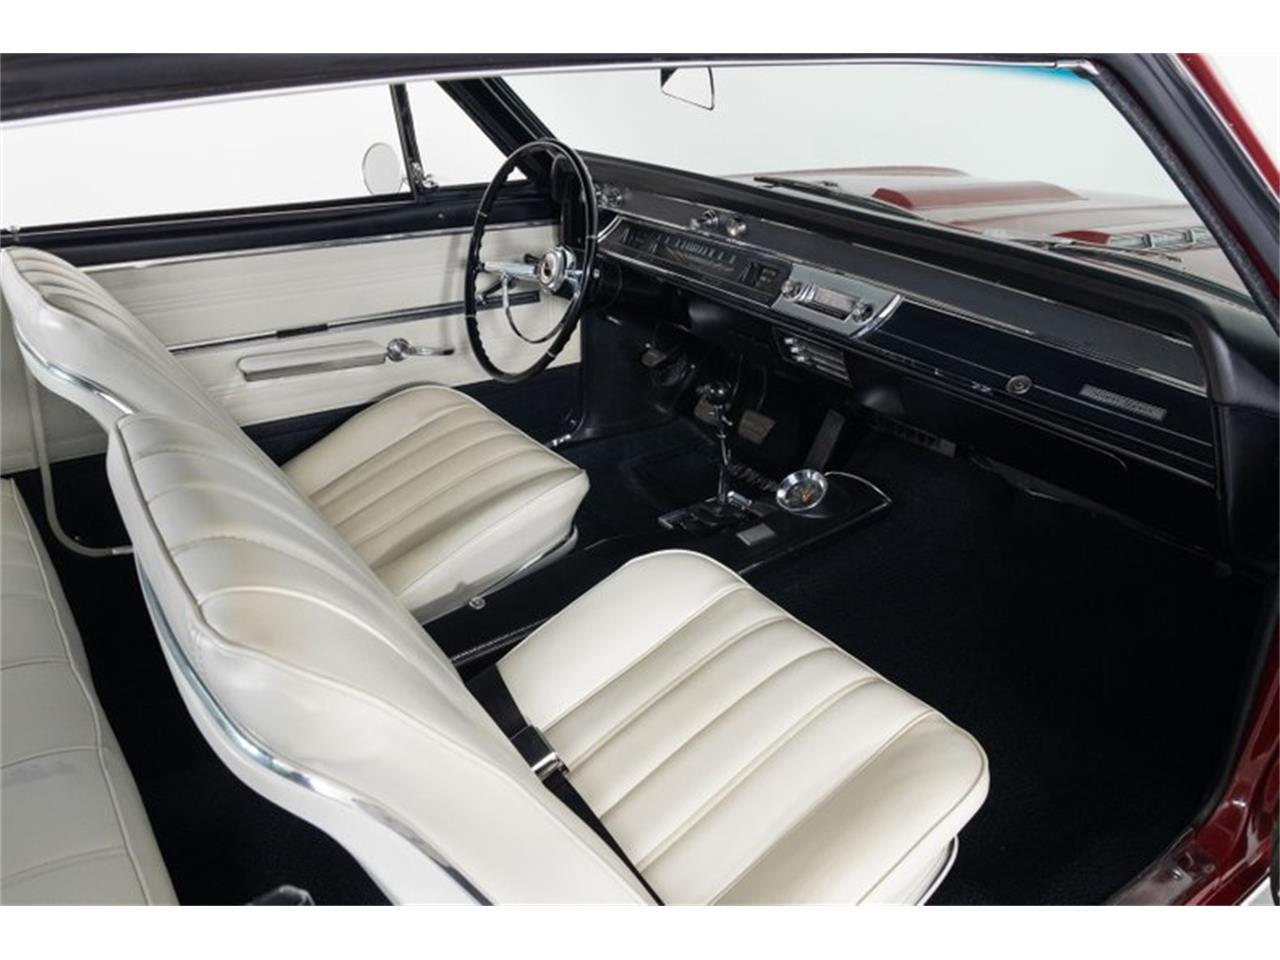 1966 Chevrolet Chevelle (CC-1314618) for sale in St. Charles, Missouri